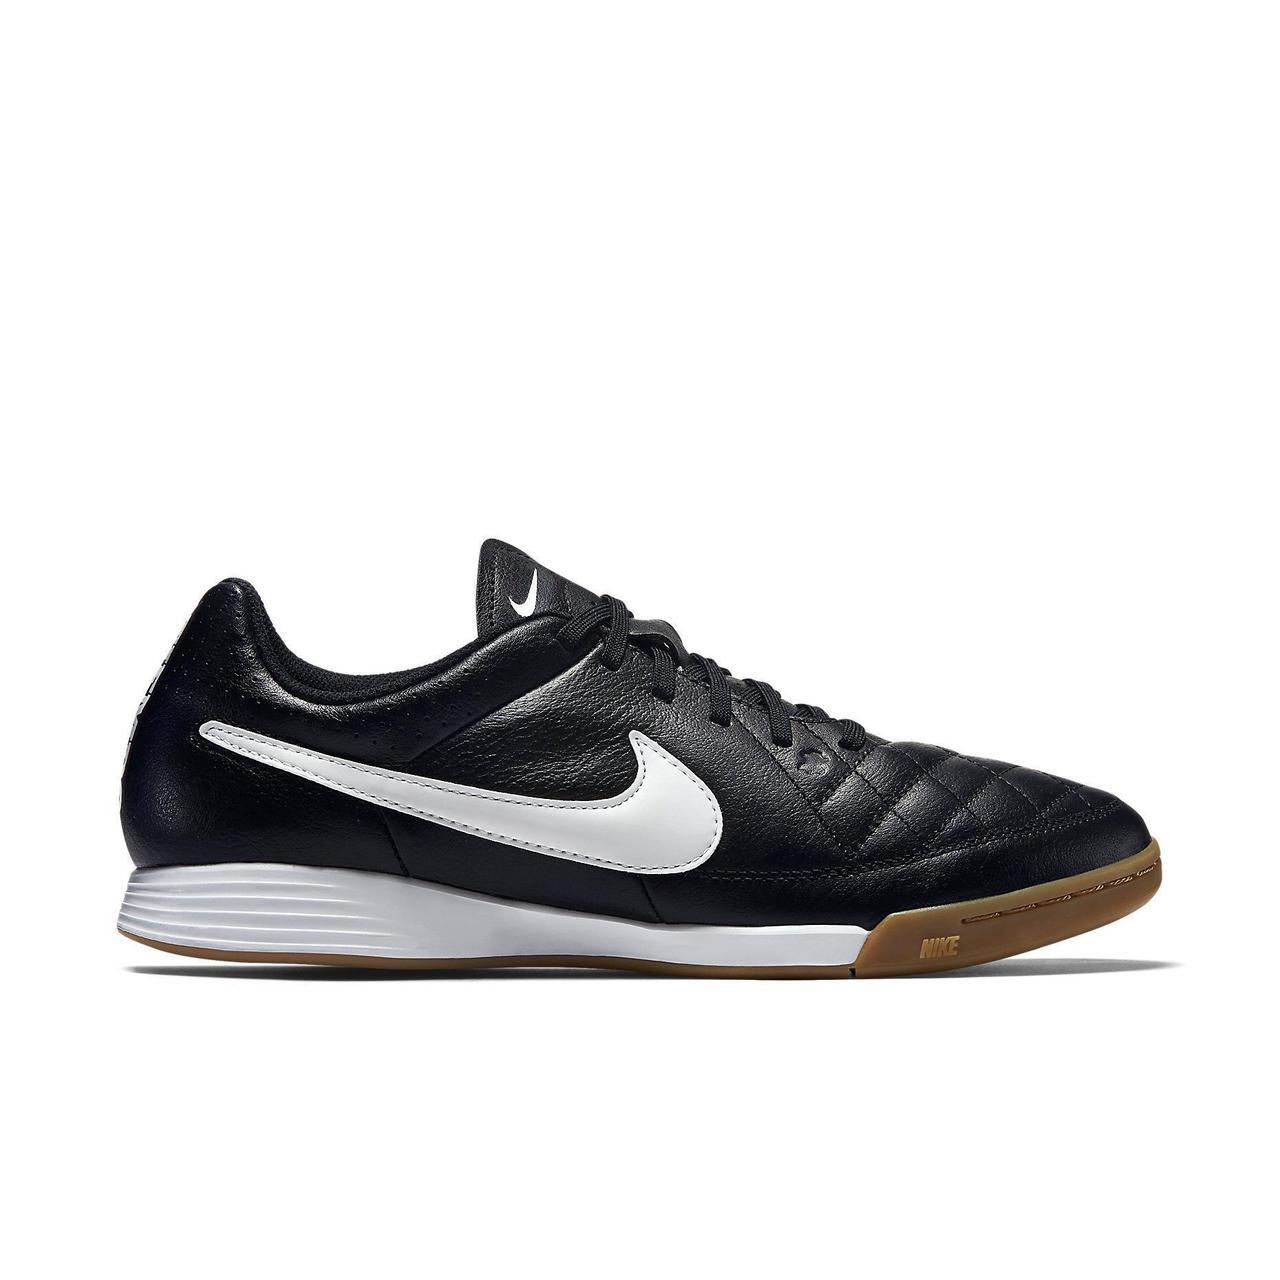 73572897371836 Футзалки Nike Tiempo Genio II IC (819215-010): продажа, цена в Киеве ...